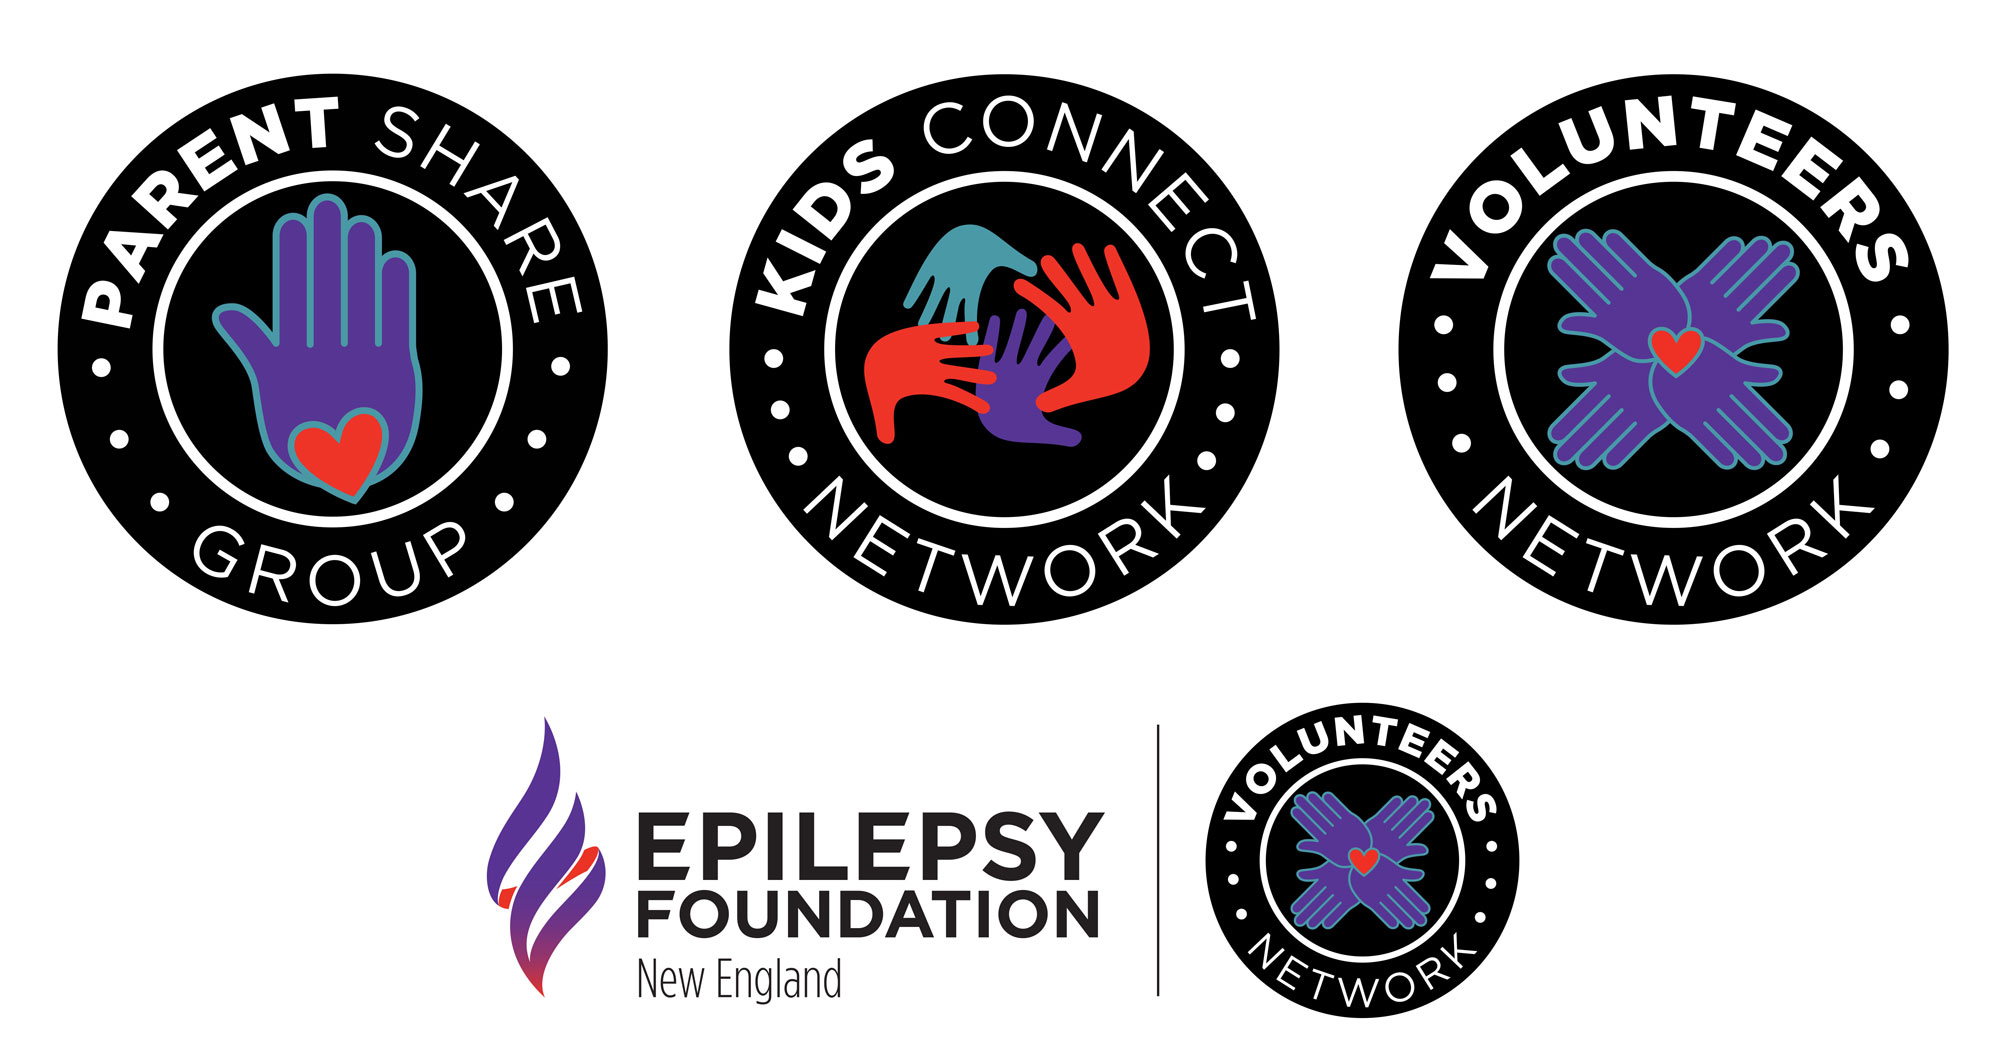 epilepsy foundation sub logo designs